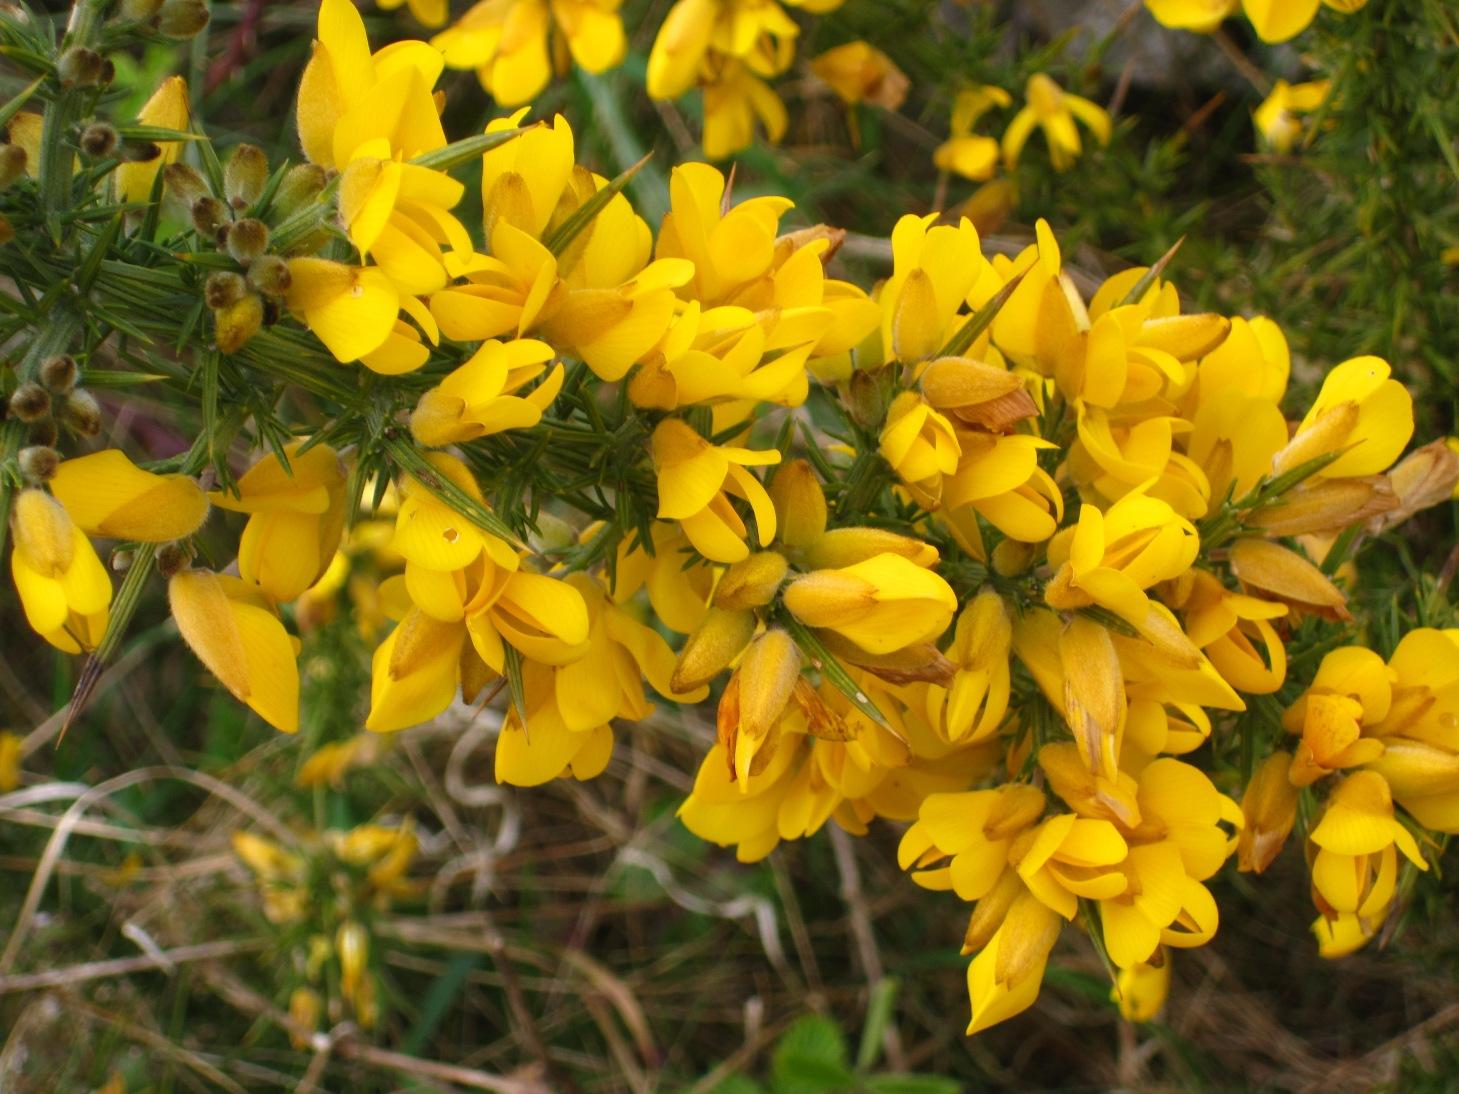 Yellow flower bush 9 background hdflowerwallpaper yellow flower bush free wallpaper mightylinksfo